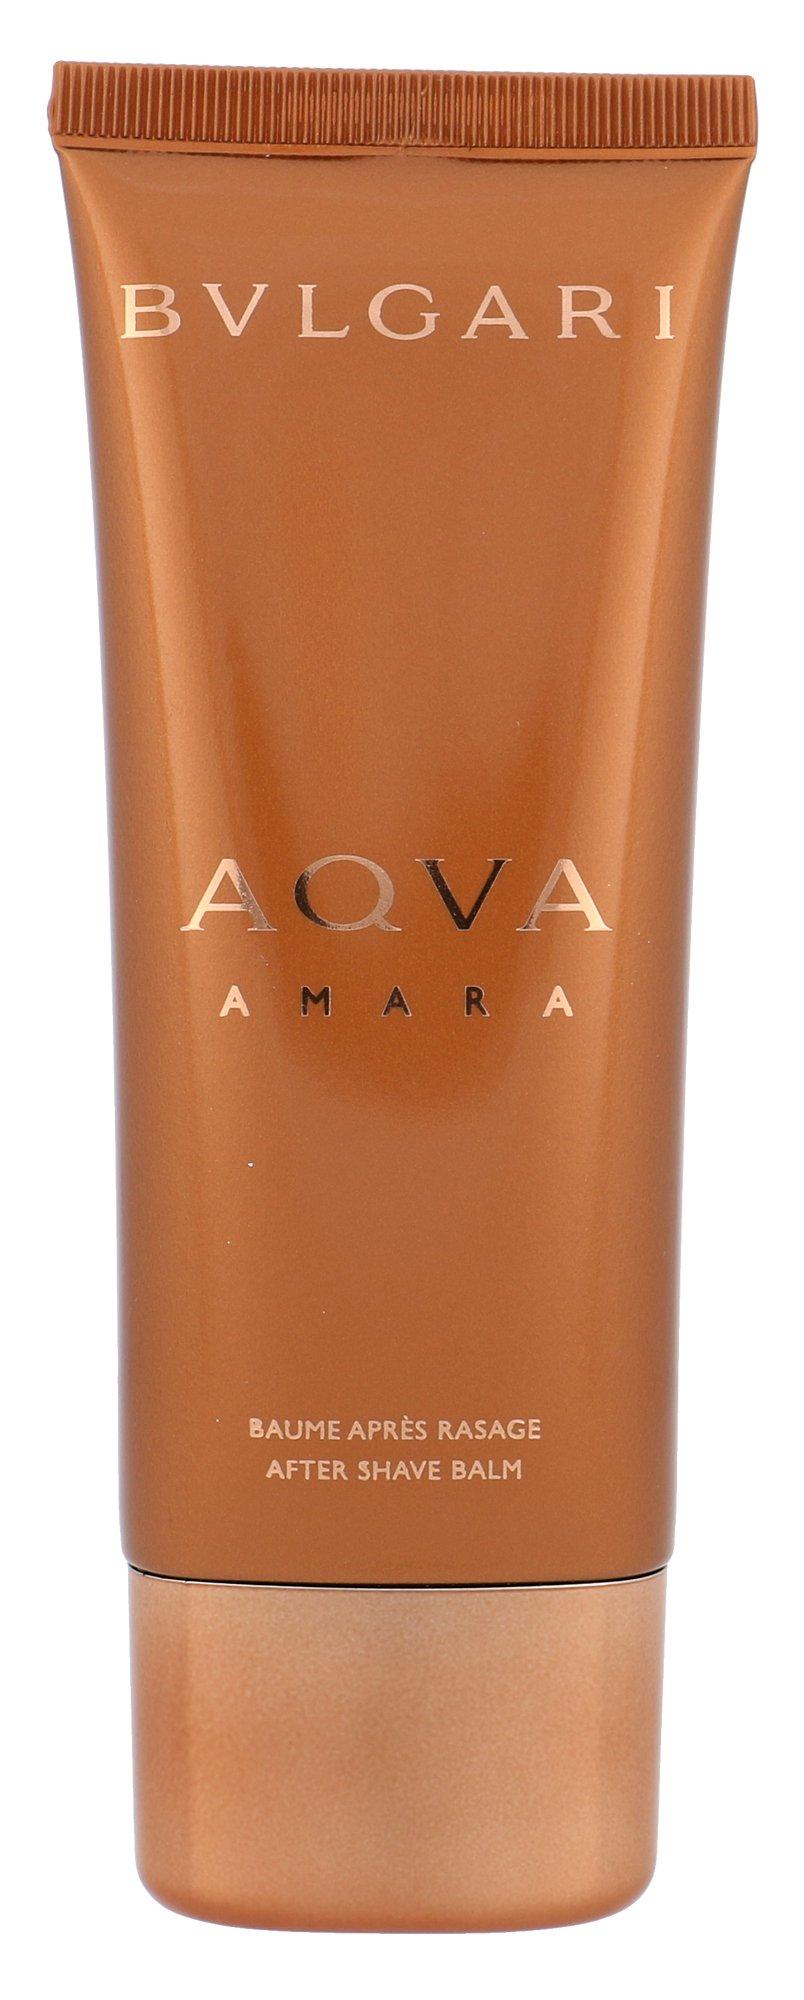 Bvlgari Aqva Amara, Balzam po holení 100ml